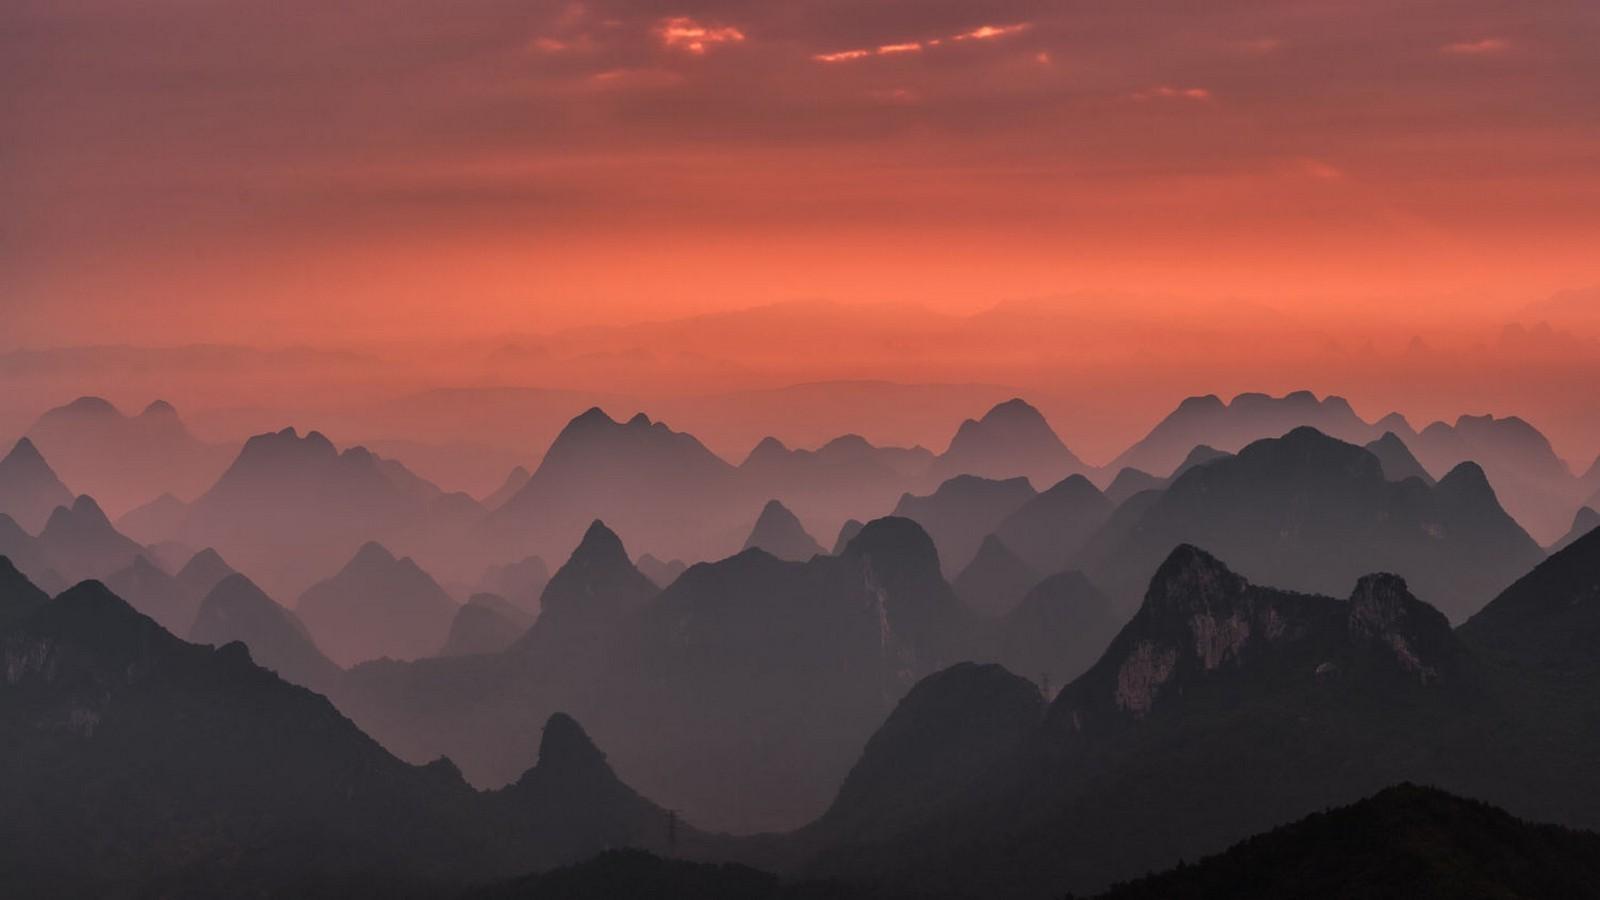 Nature, Landscape, Sunrise, Mountains, Mist, Pink, - Pink Sunrise Mountain Background , HD Wallpaper & Backgrounds